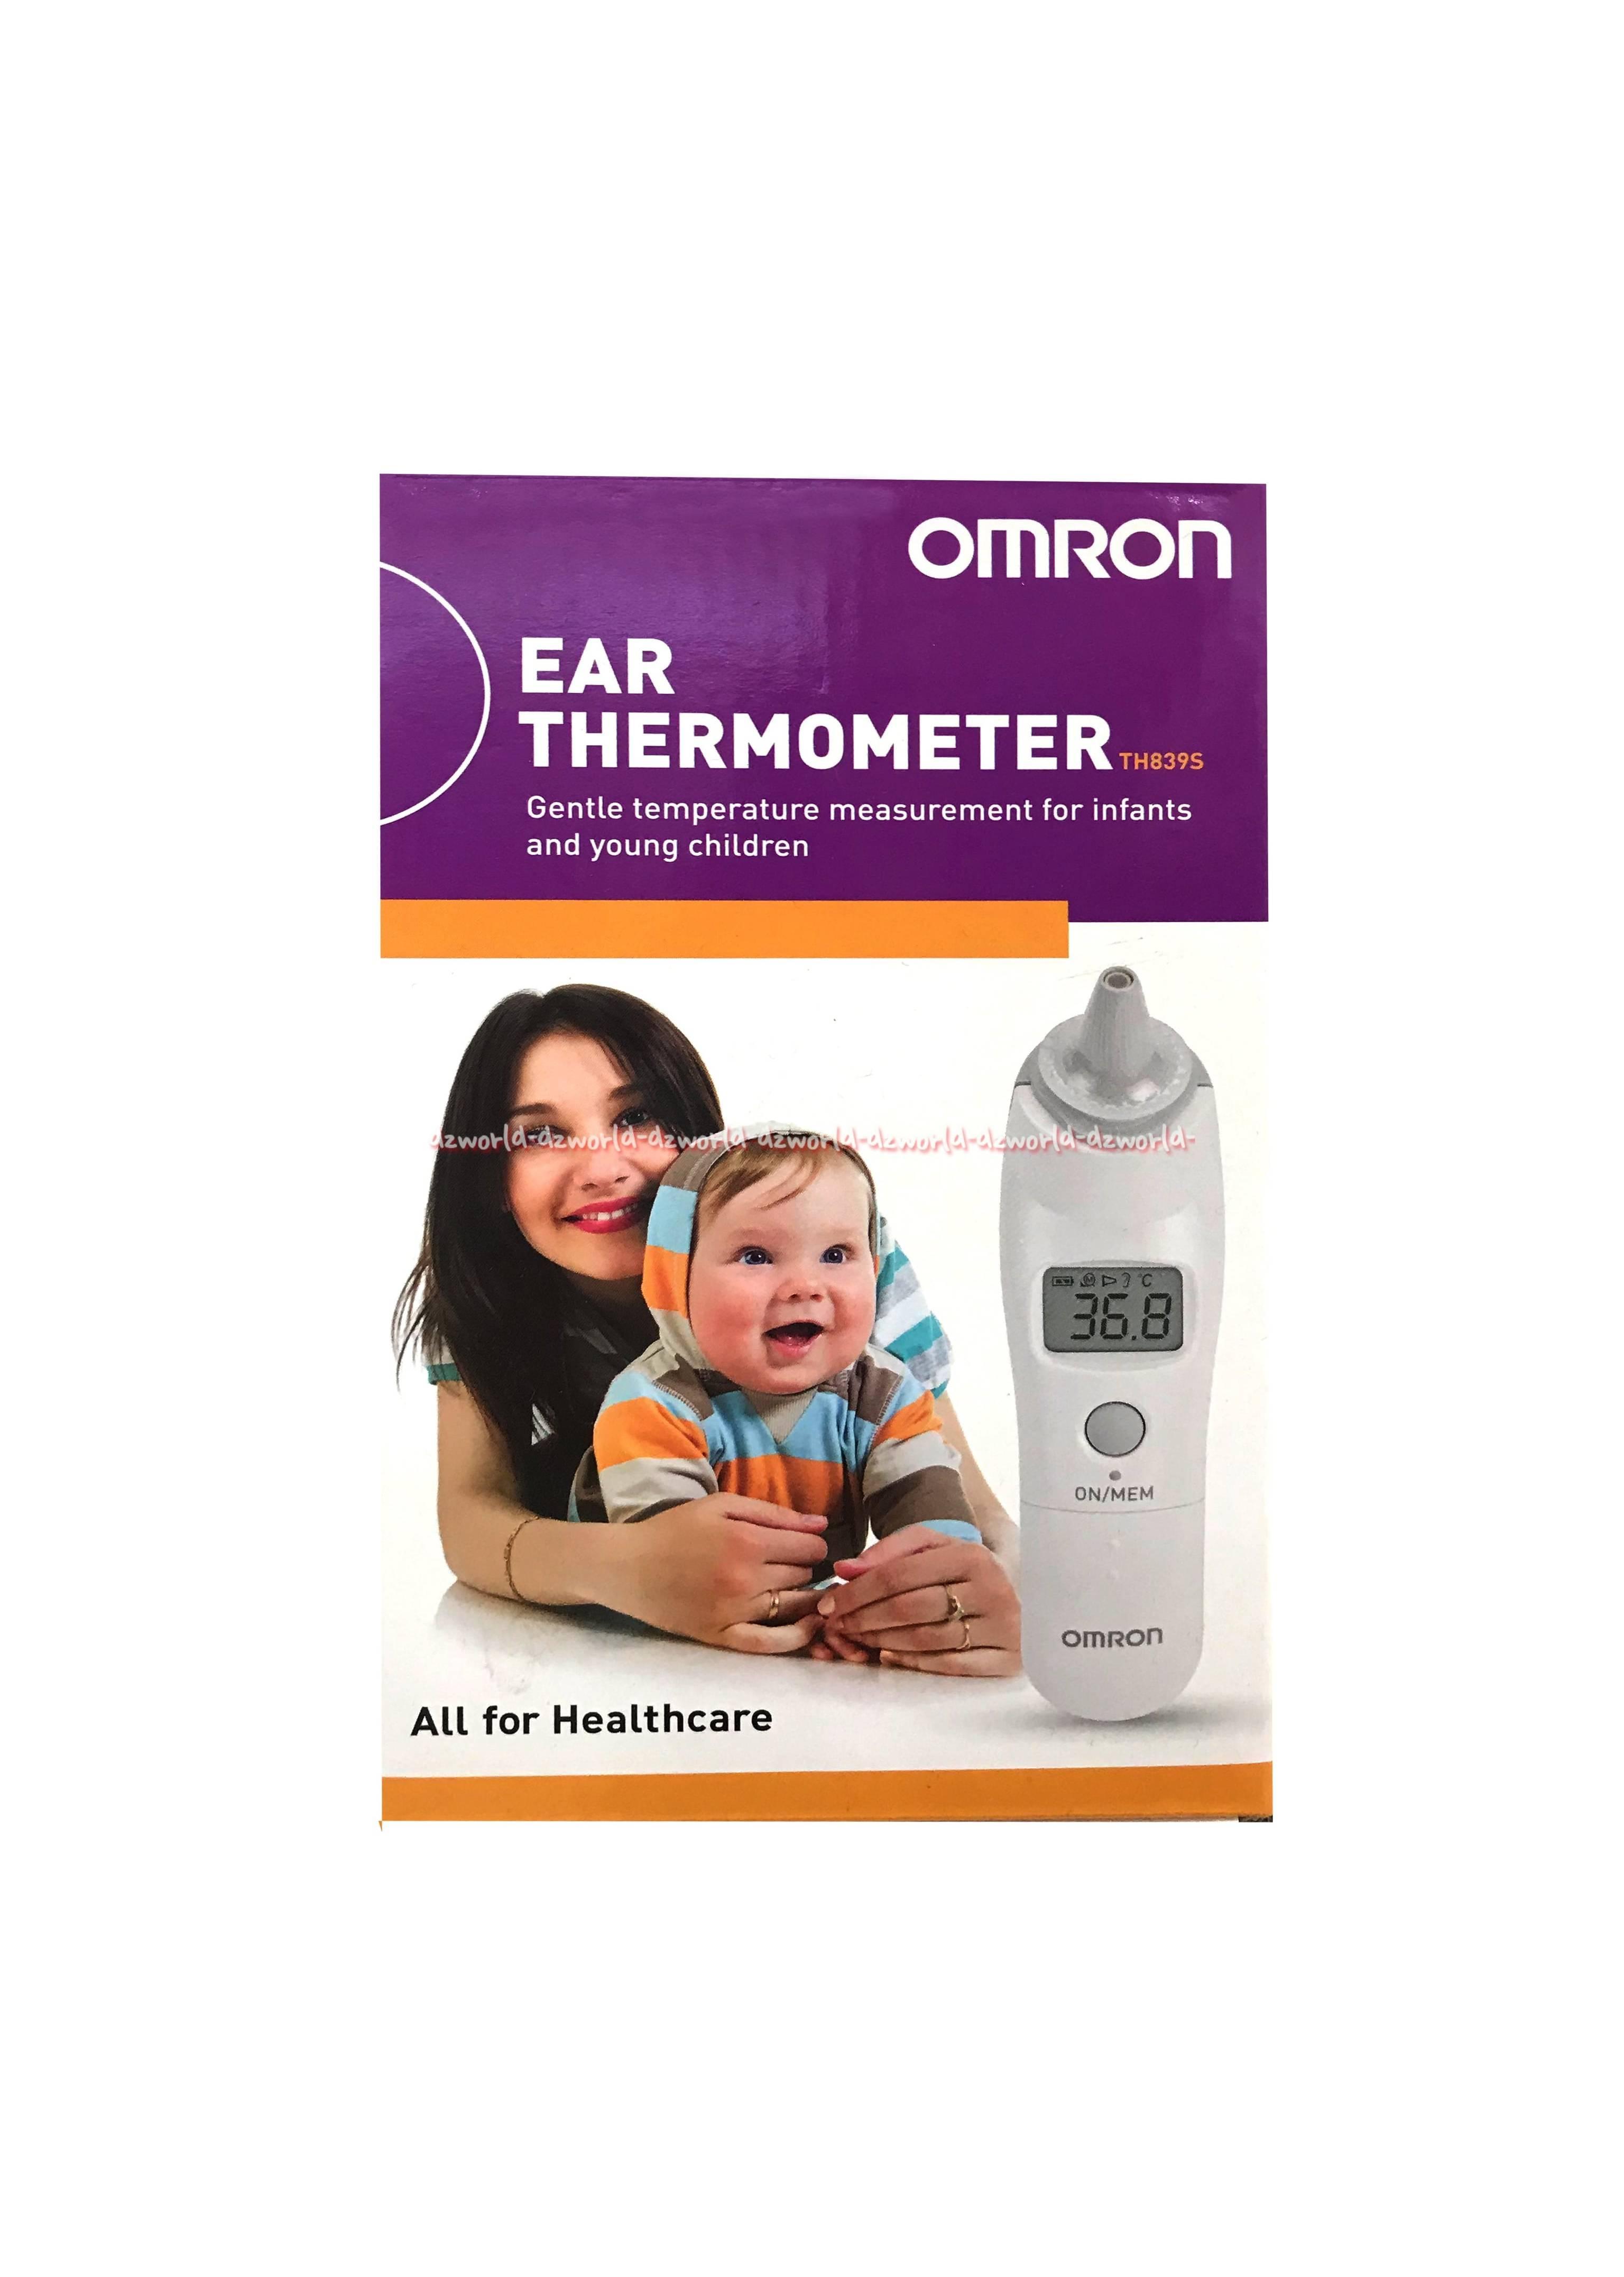 Omron Ear Thermometer TH839S alat pengukur suhu melalui telinga